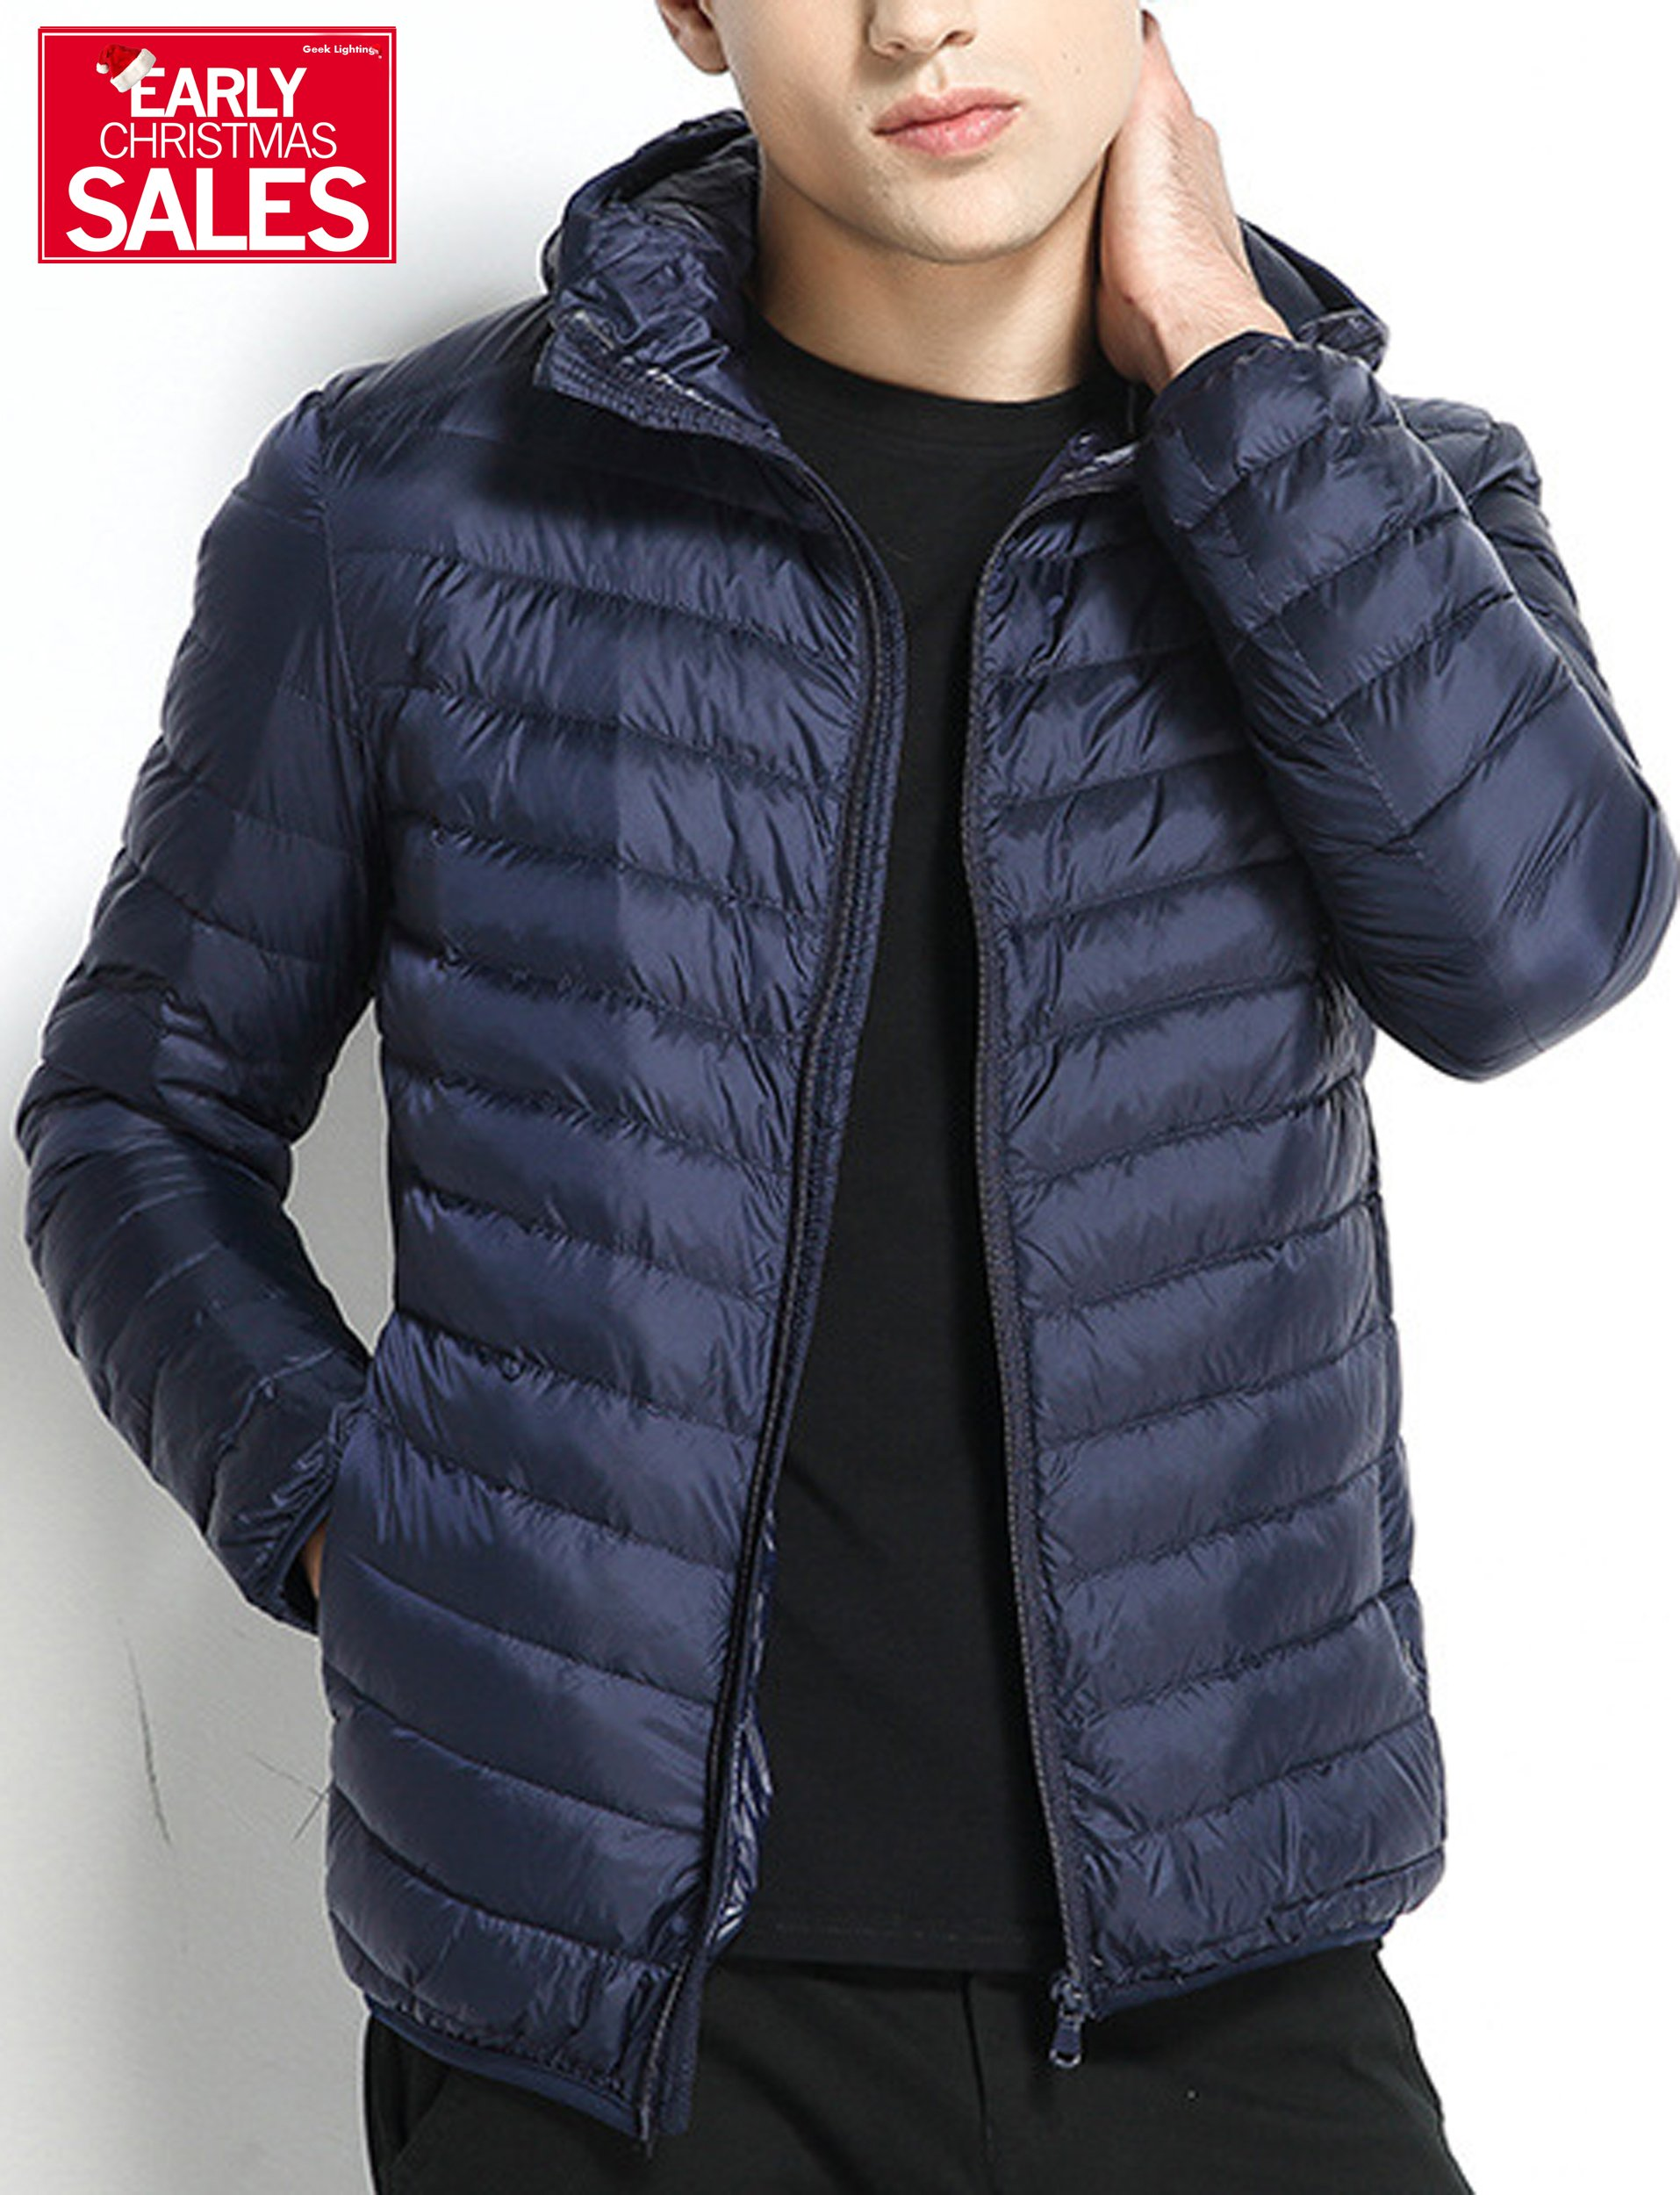 Men's Packable Hooded Down-Fill Puffer Jacket Light Waterproof Coats Indigo US Medium/Tag XX-Large by GEEK LIGHTING